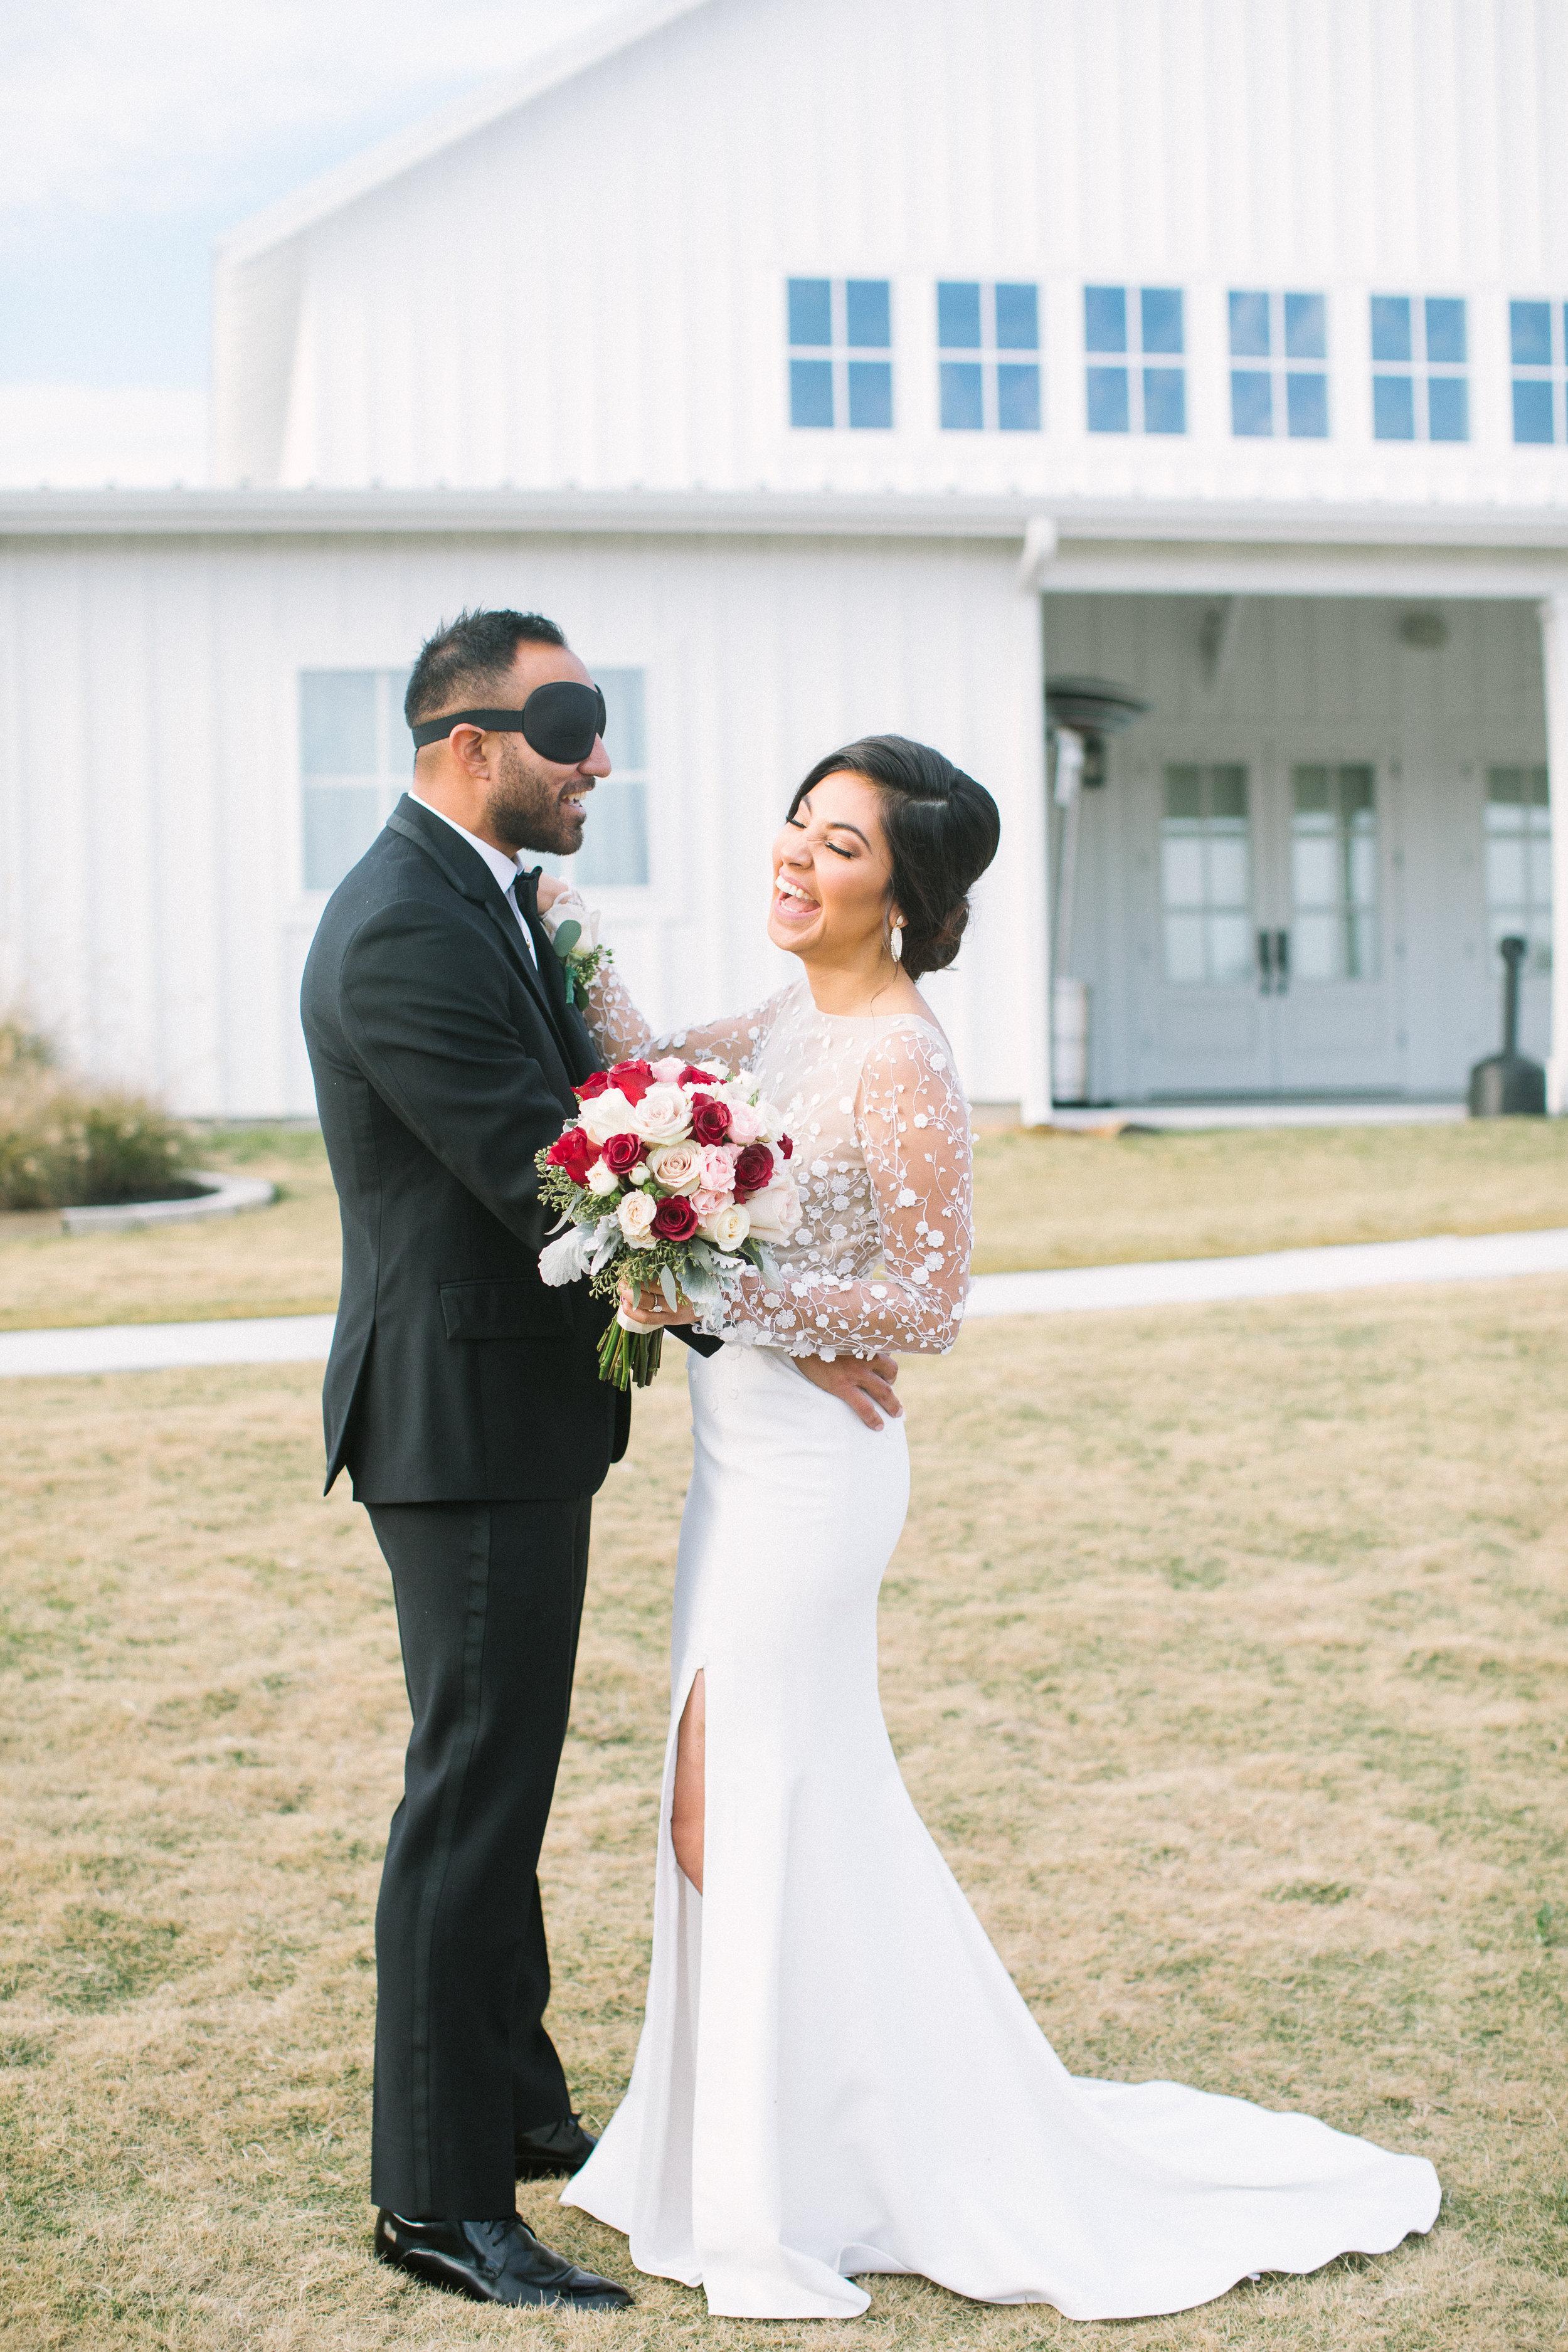 Ellen-Ashton-Photography-Dallas-Wedding-Photographers-Wed-and-Prosper-weddings-and-Events-The-Farmhouse-Events-Montgomery-Texas-Arturo-Alvarez-Houston-Dynamo-Style-Me-Pretty-Brides-of-North-Texas-Brides-of-Houston-White-Sparrow-Barn-Weddings-The-Nest-at-Ruths-Farms-Weddings